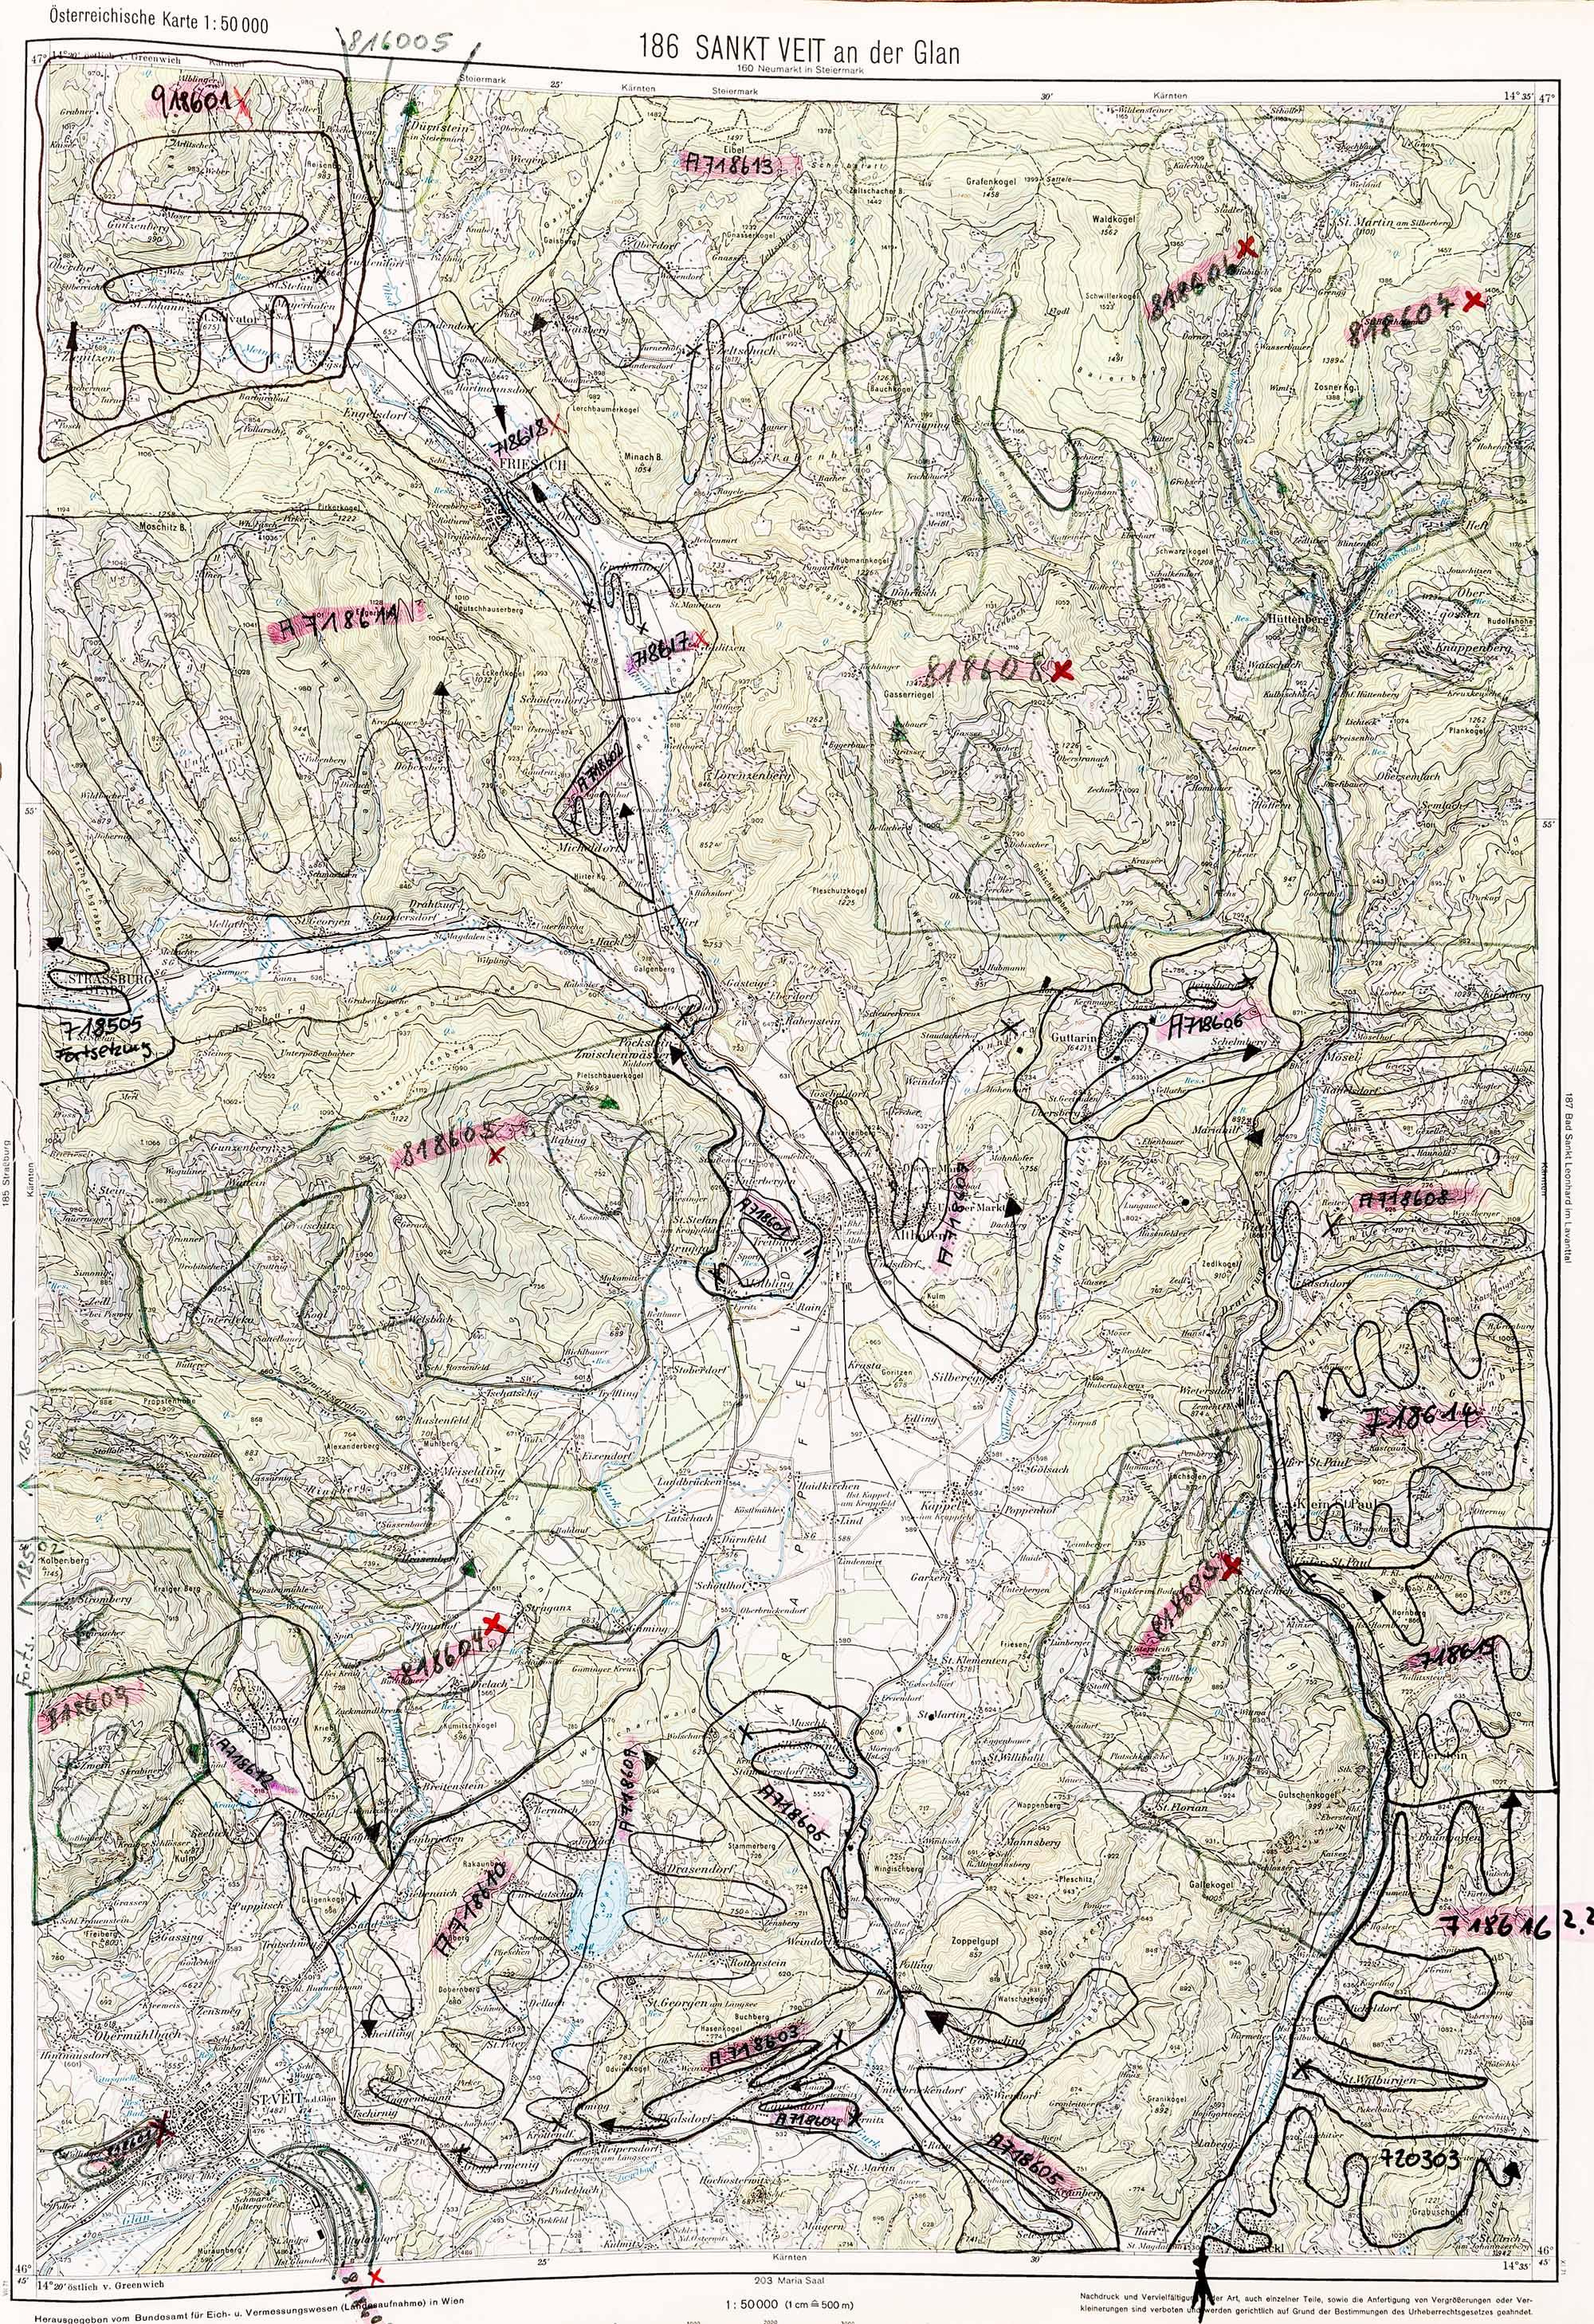 1975-1979 Karte 186